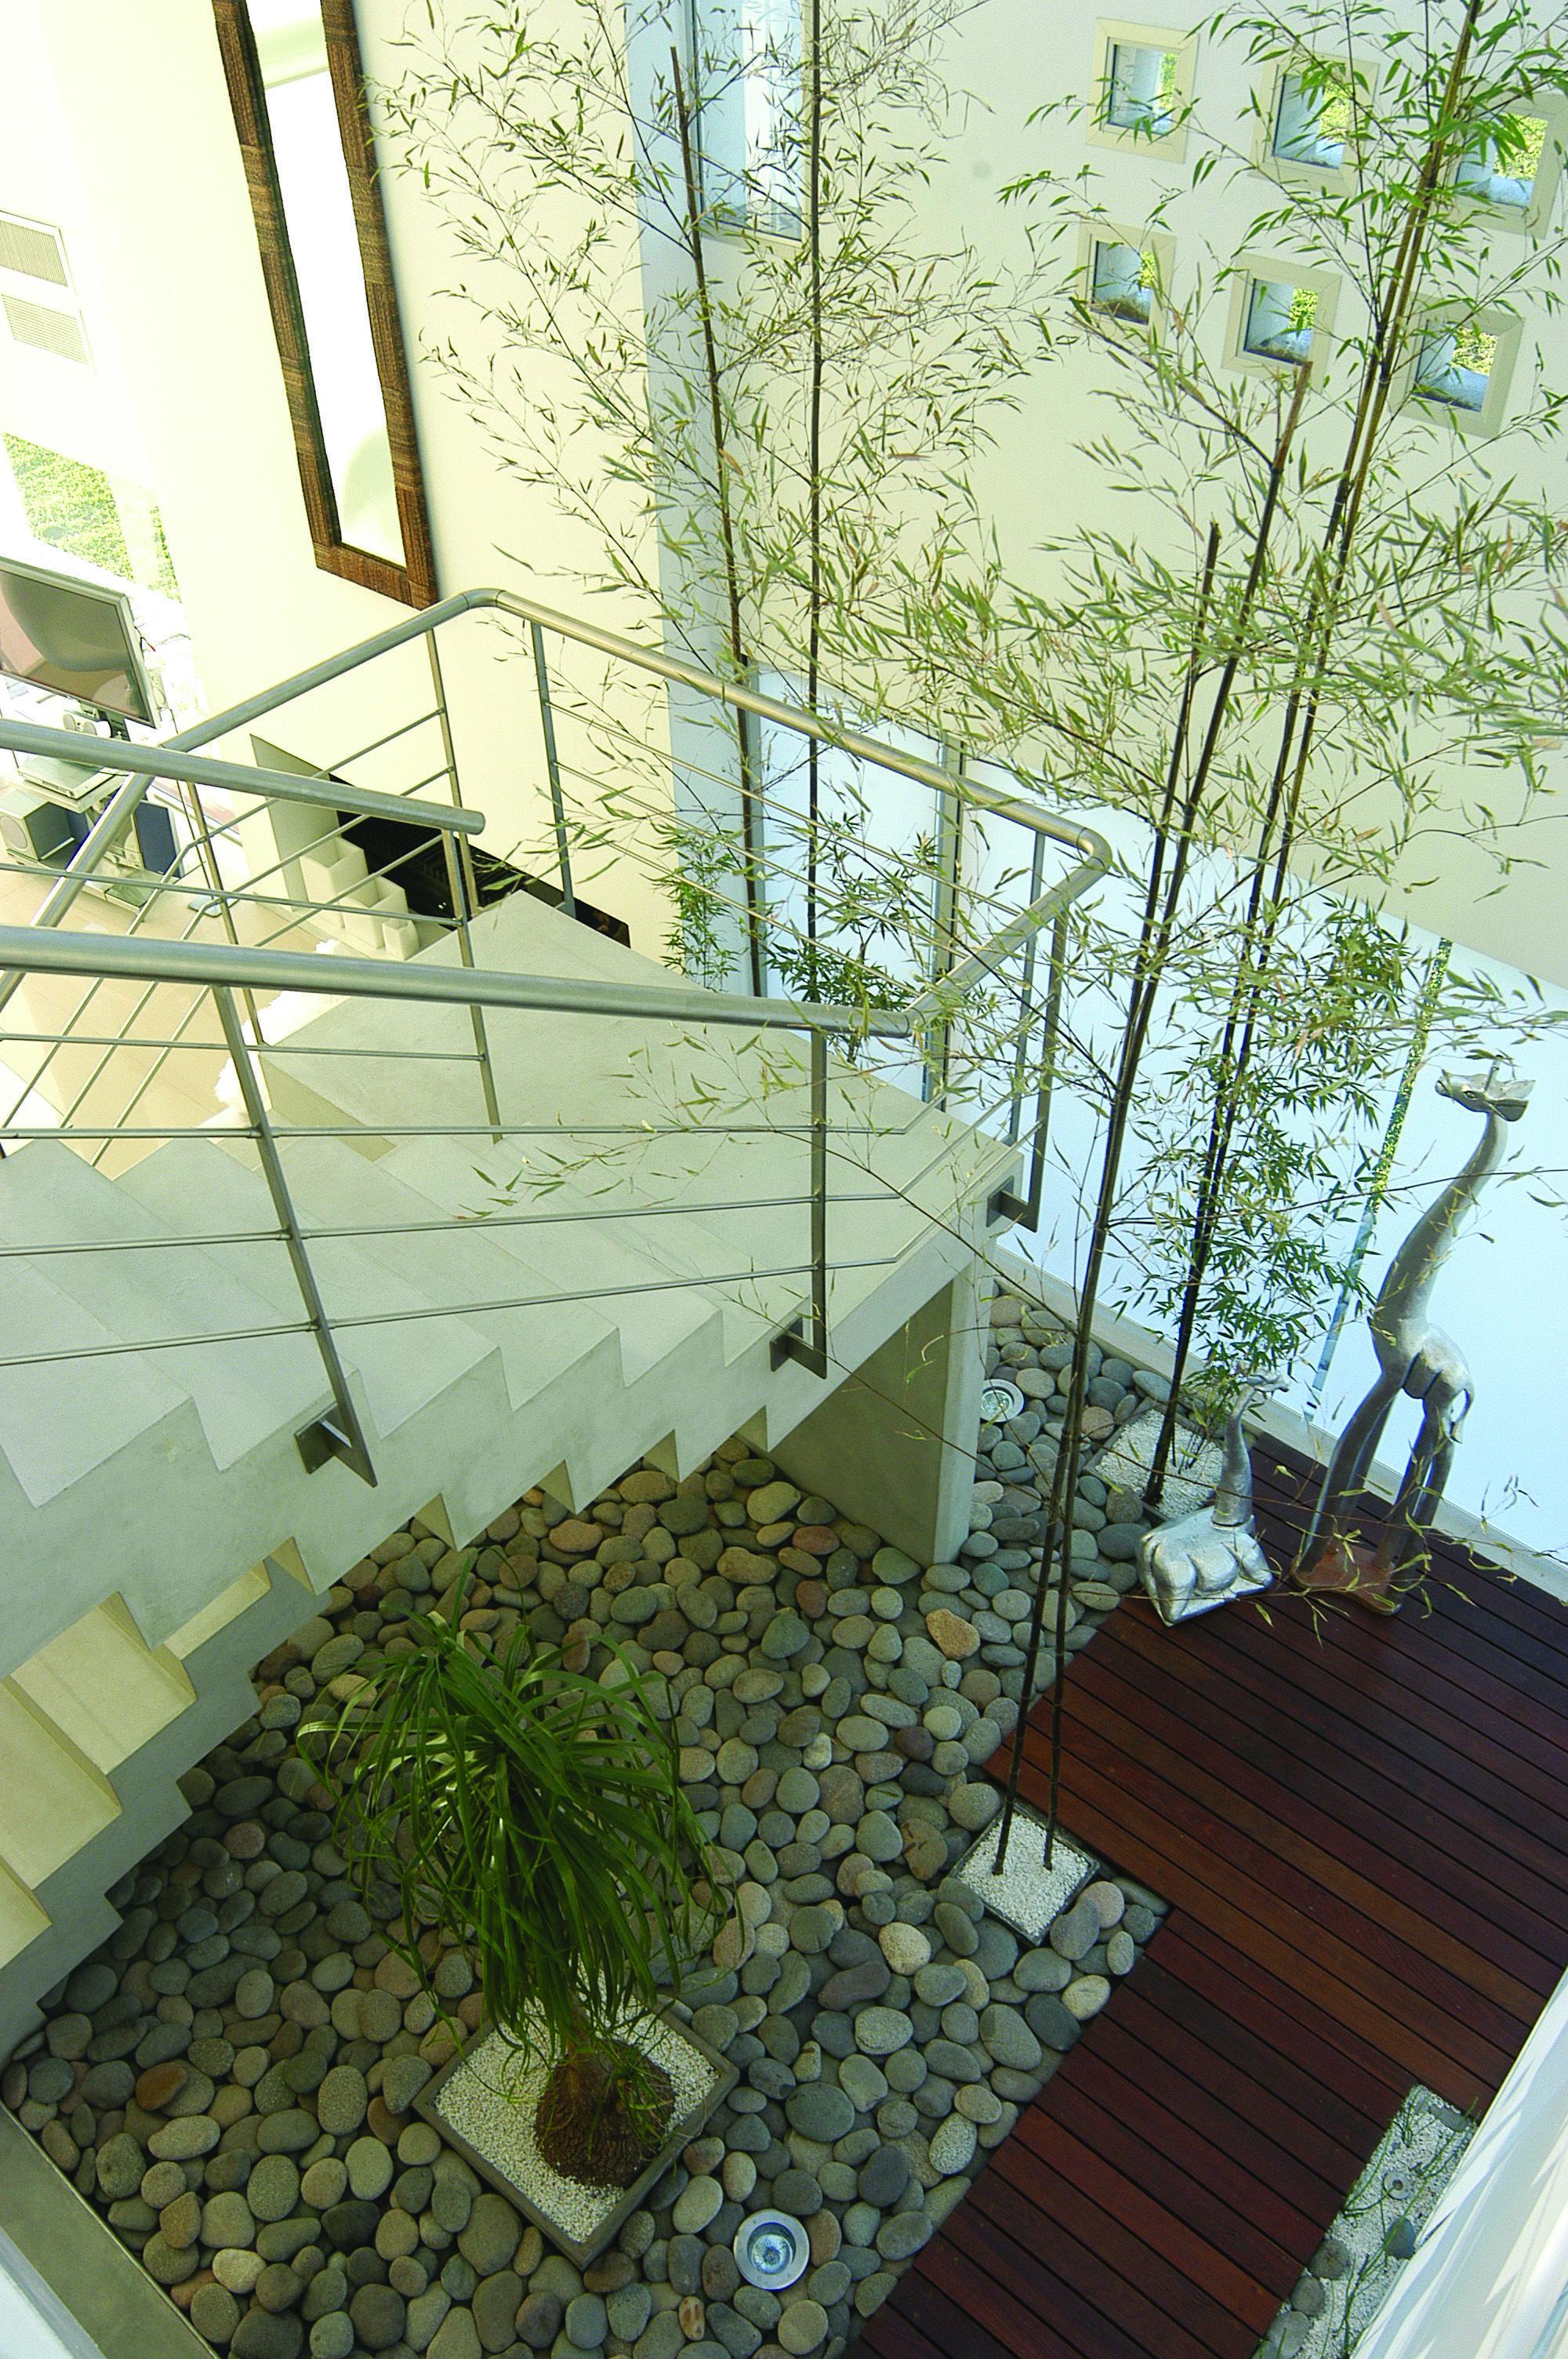 Casa castores patios internos casas arquitectura - Jardines exteriores de casas modernas ...